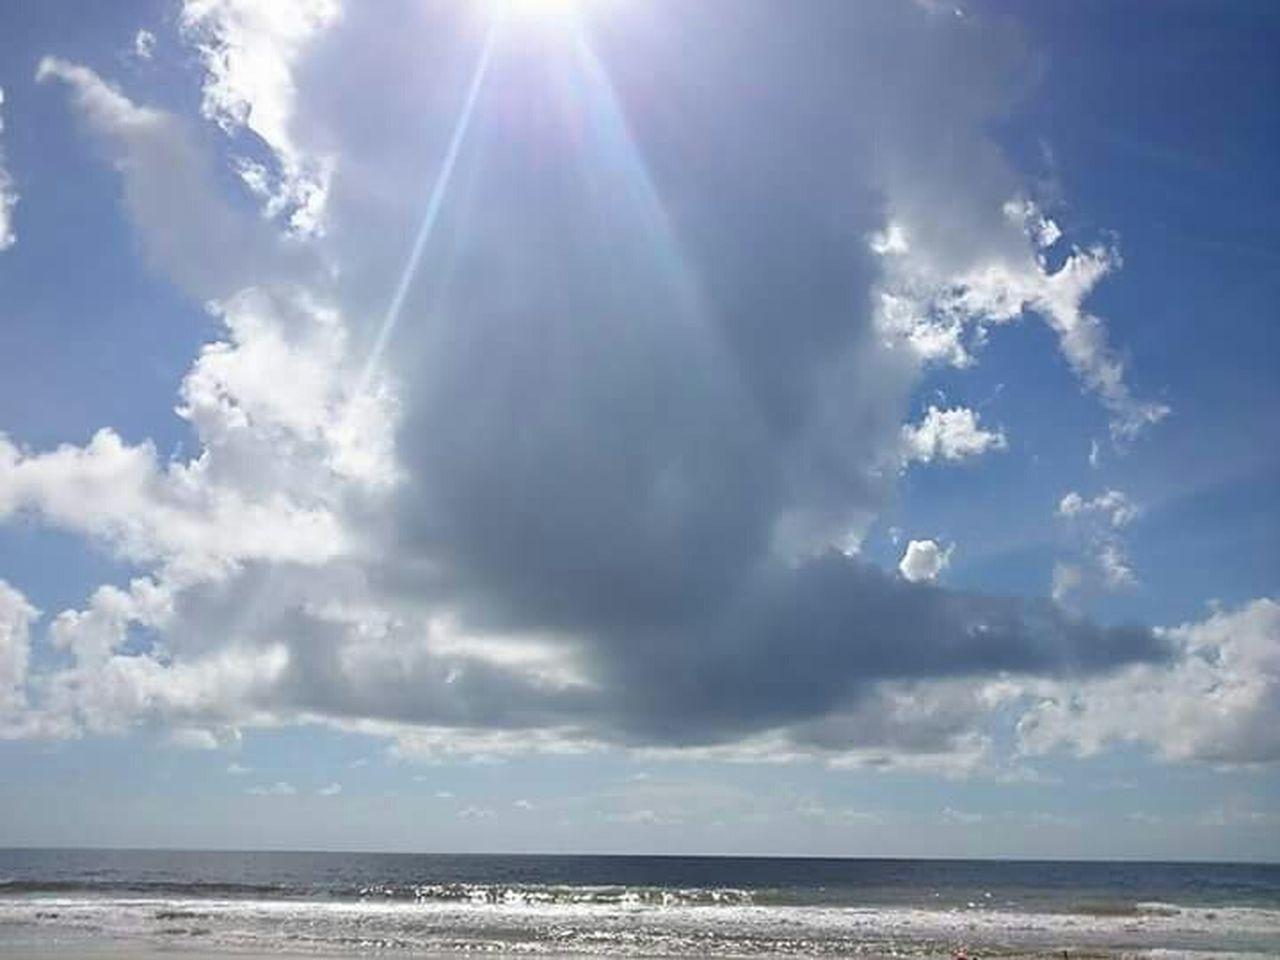 sky, sea, horizon over water, cloud - sky, sunlight, tranquility, tranquil scene, sunbeam, scenics, nature, beauty in nature, day, outdoors, idyllic, water, sun, no people, beach